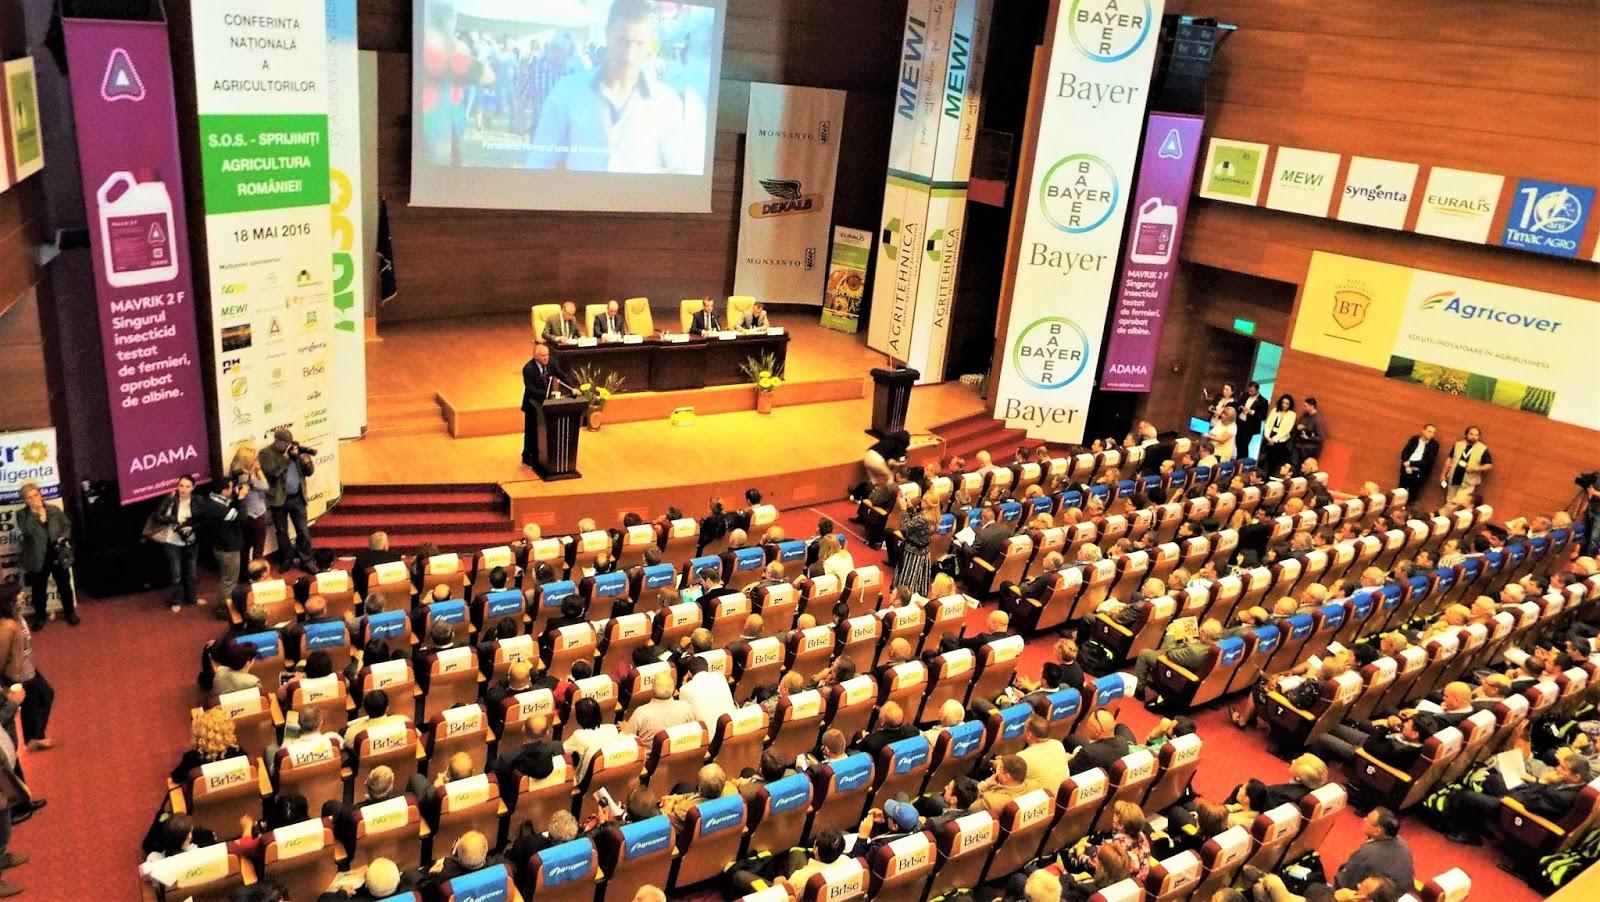 Peste 1.000 de fermieri participa la Conferinta Nationala LAPAR